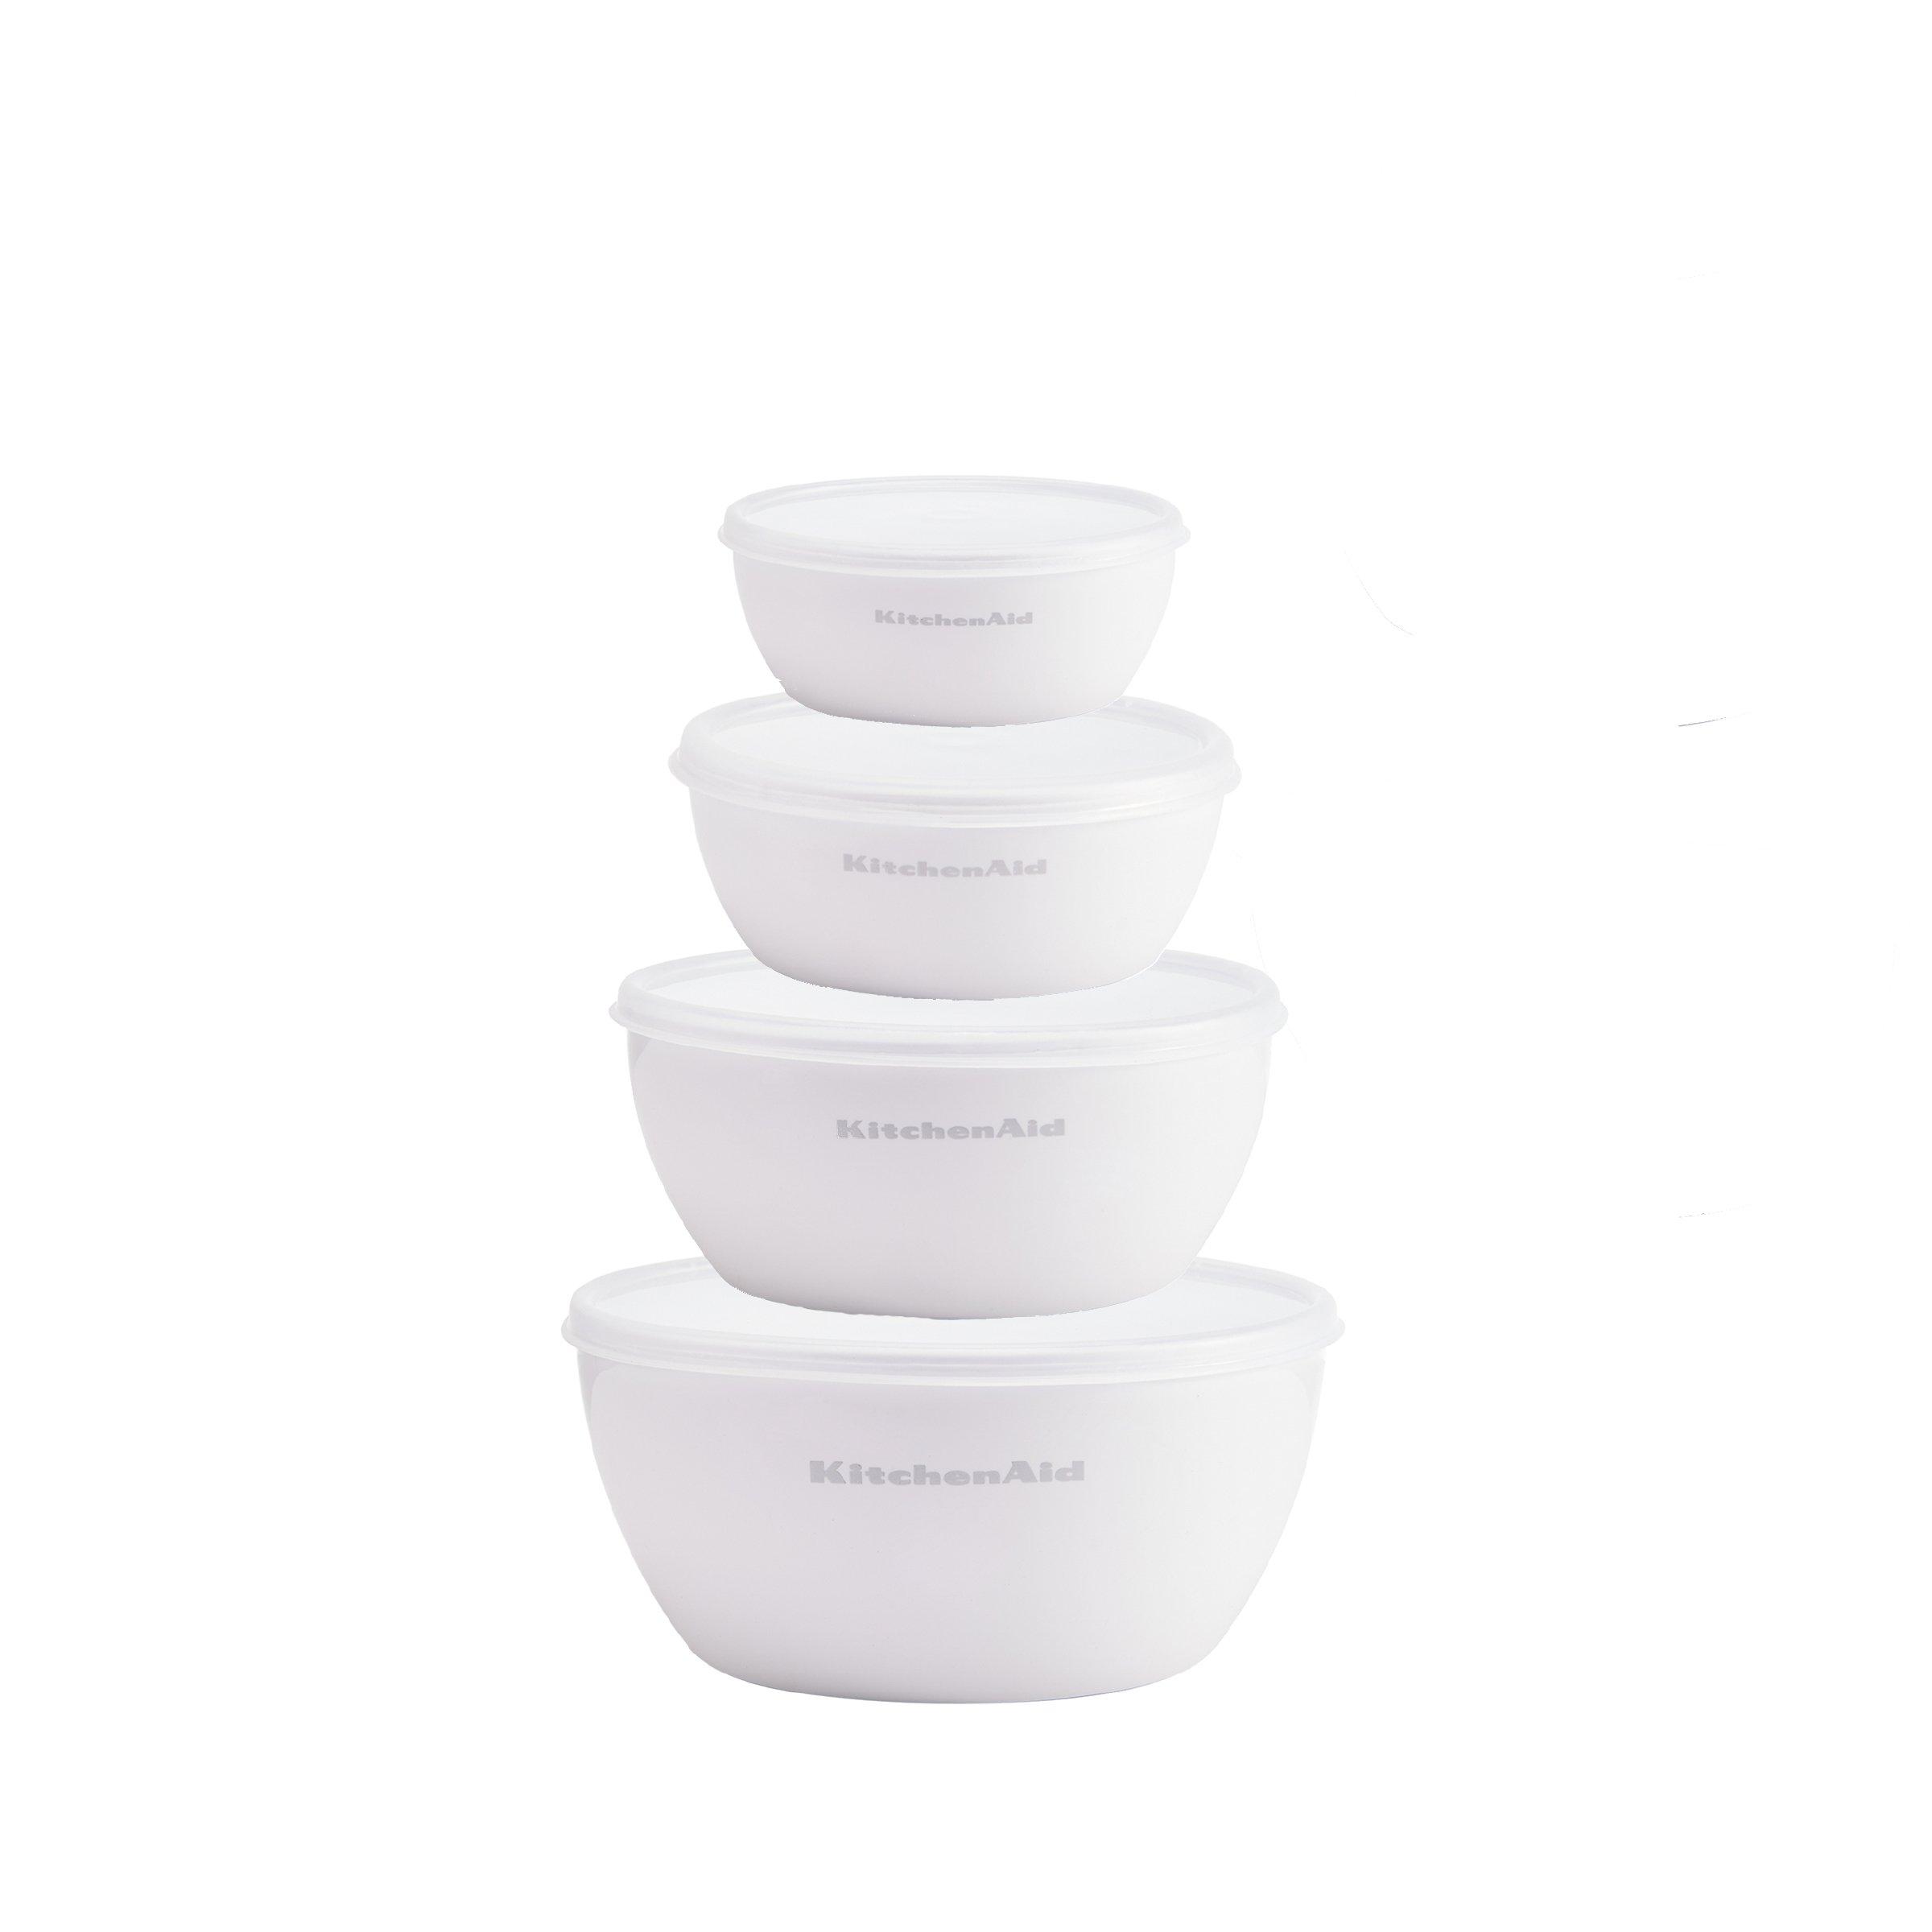 KitchenAid Prep Bowls with Lids, Set of 4, White